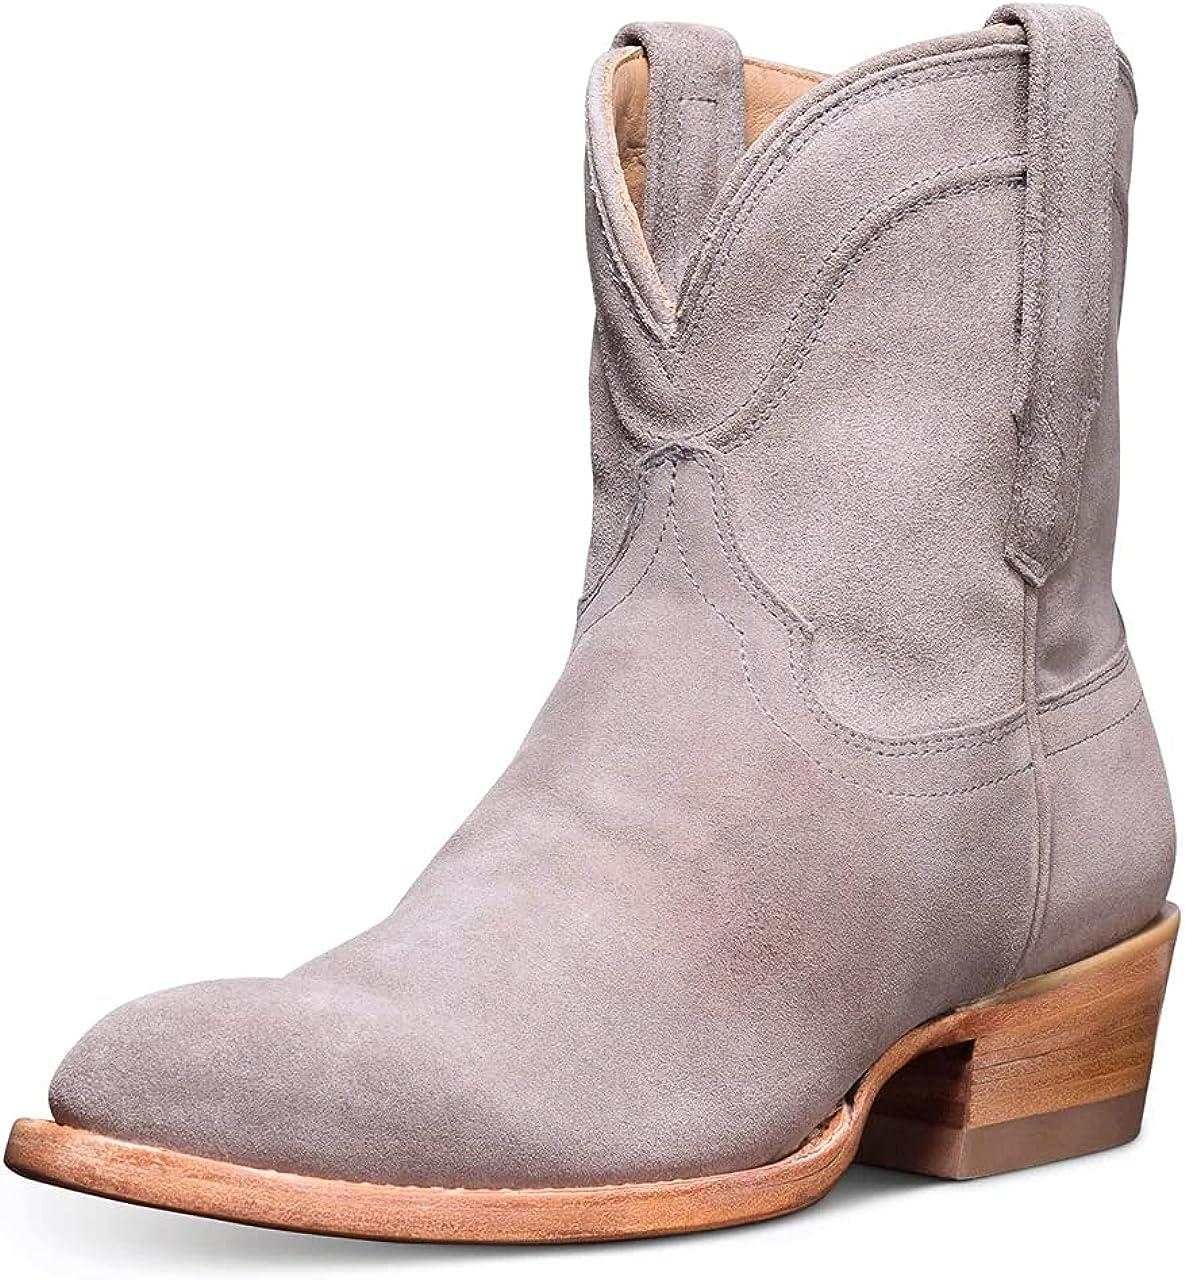 Womens Western Cowboy Bootie Nashville-Davidson Mall Leather Vintage Max 50% OFF Toe Round Chunky Mi